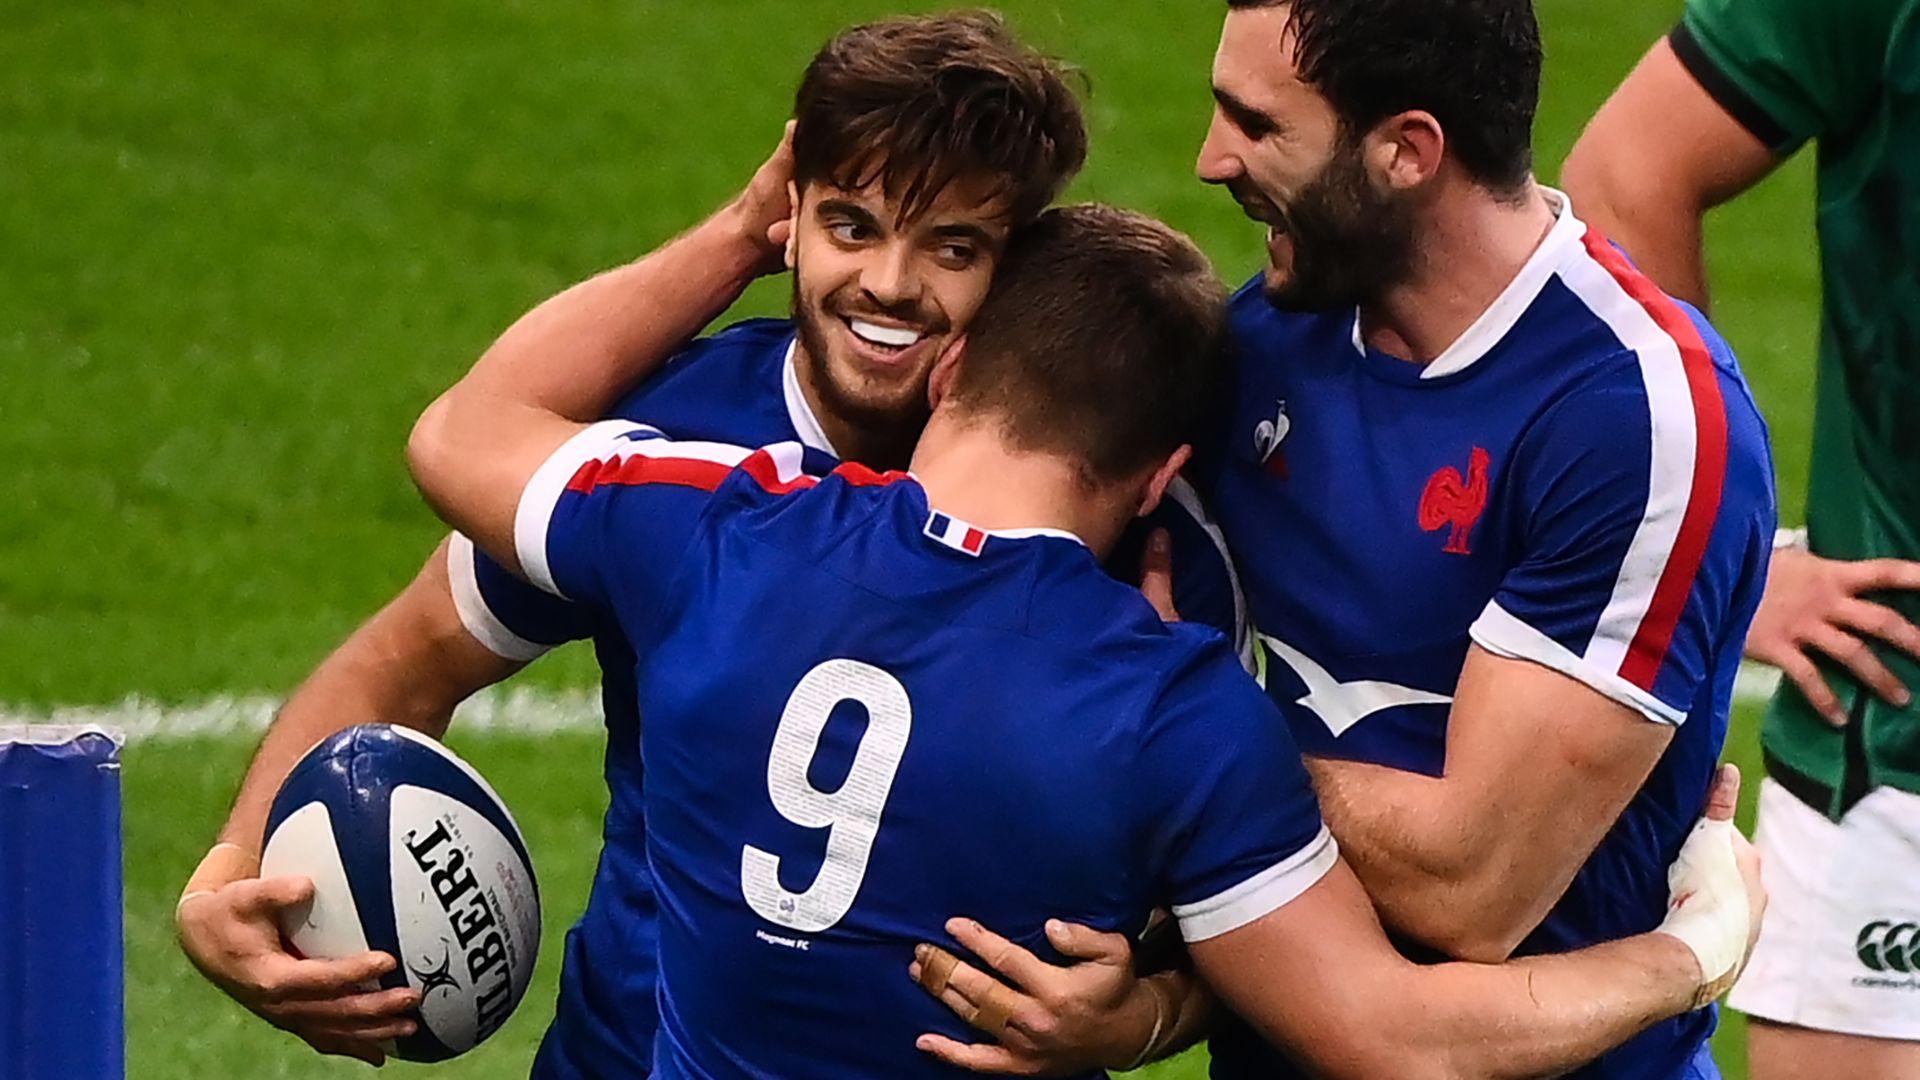 France given 28-0 bonus-point win over Fiji